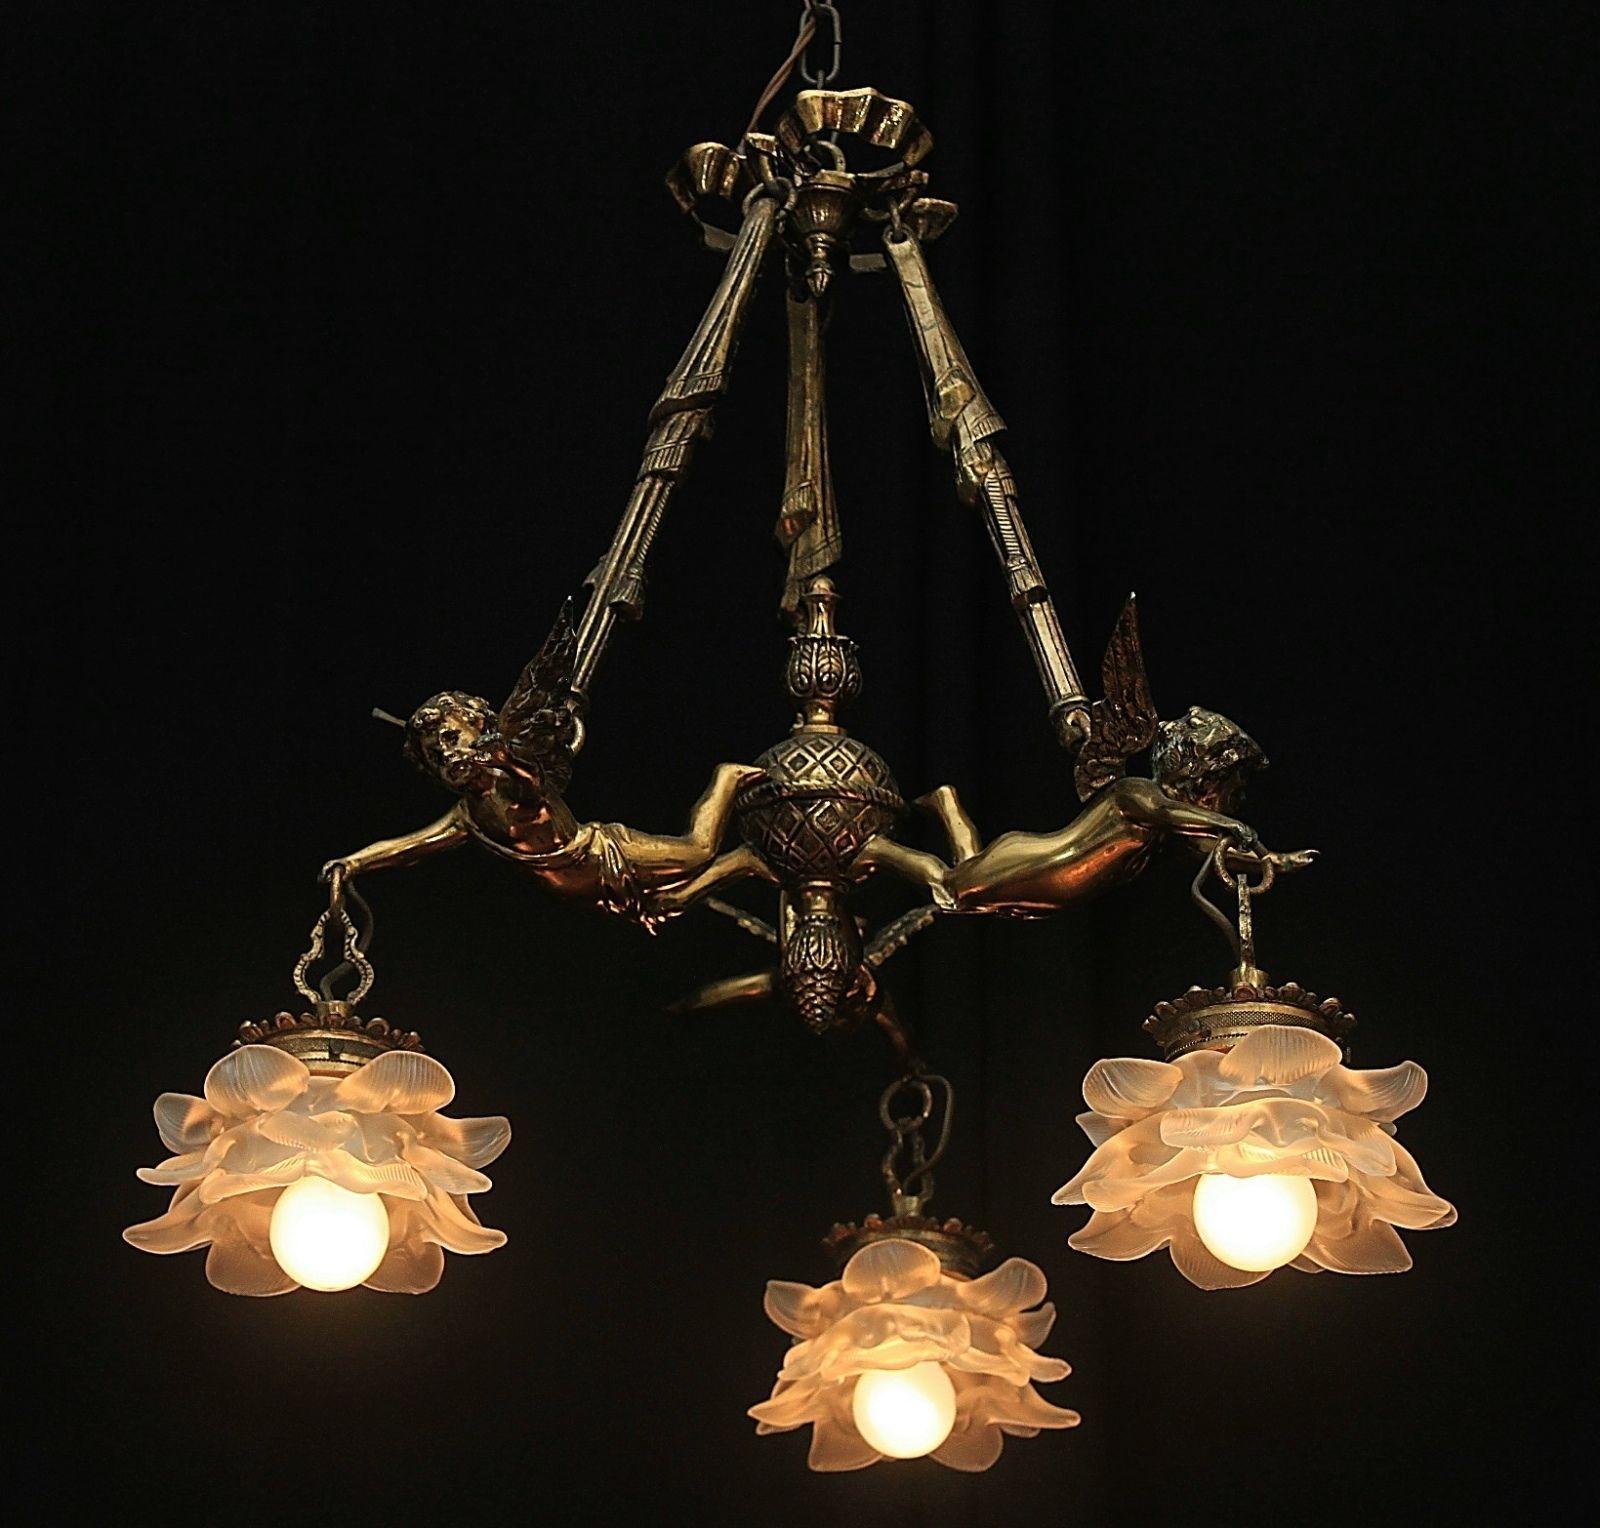 Vintage bronze french shabby flying chic cherub chandelier with vintage bronze french shabby flying chic cherub chandelier with shades ebay arubaitofo Gallery